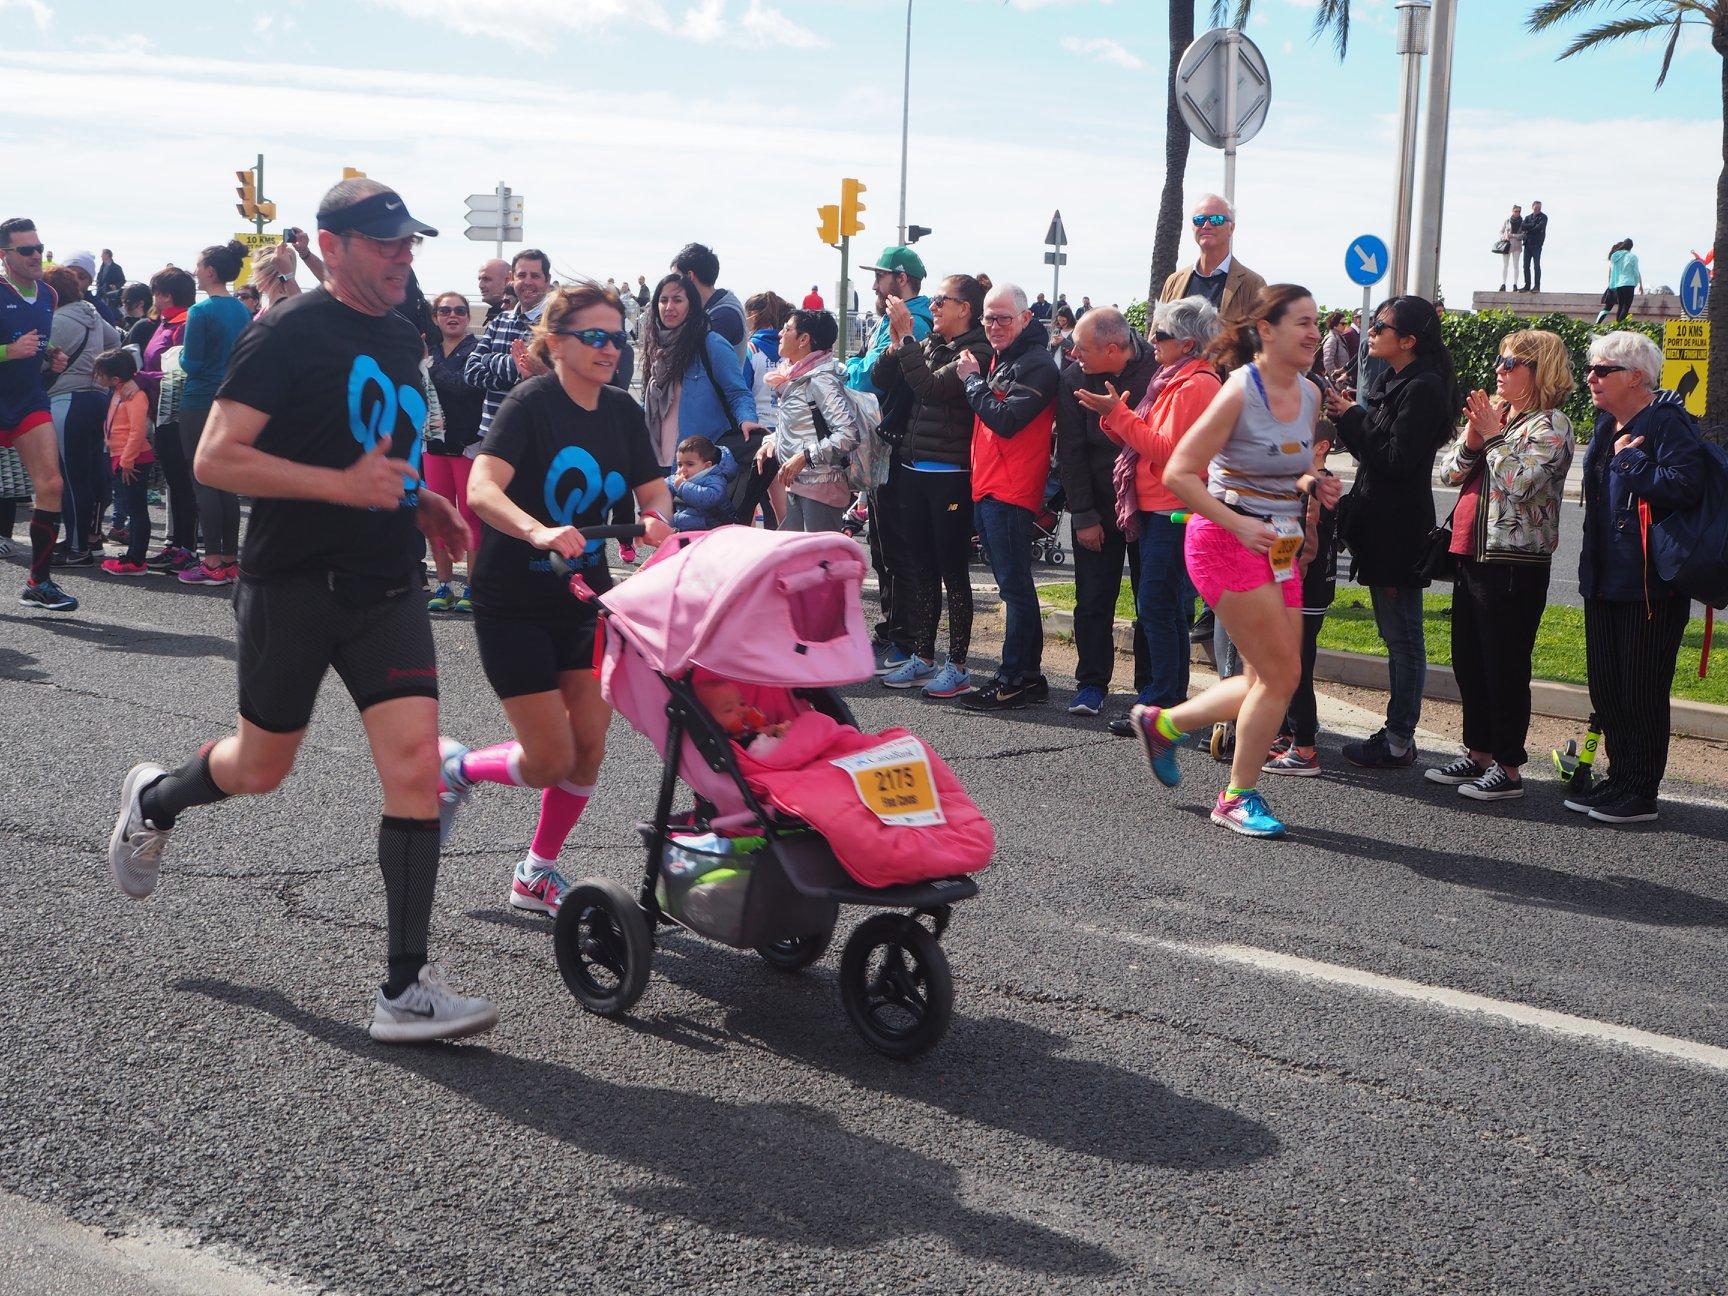 Half Marathon Palma de Mallorca: Family with Baby